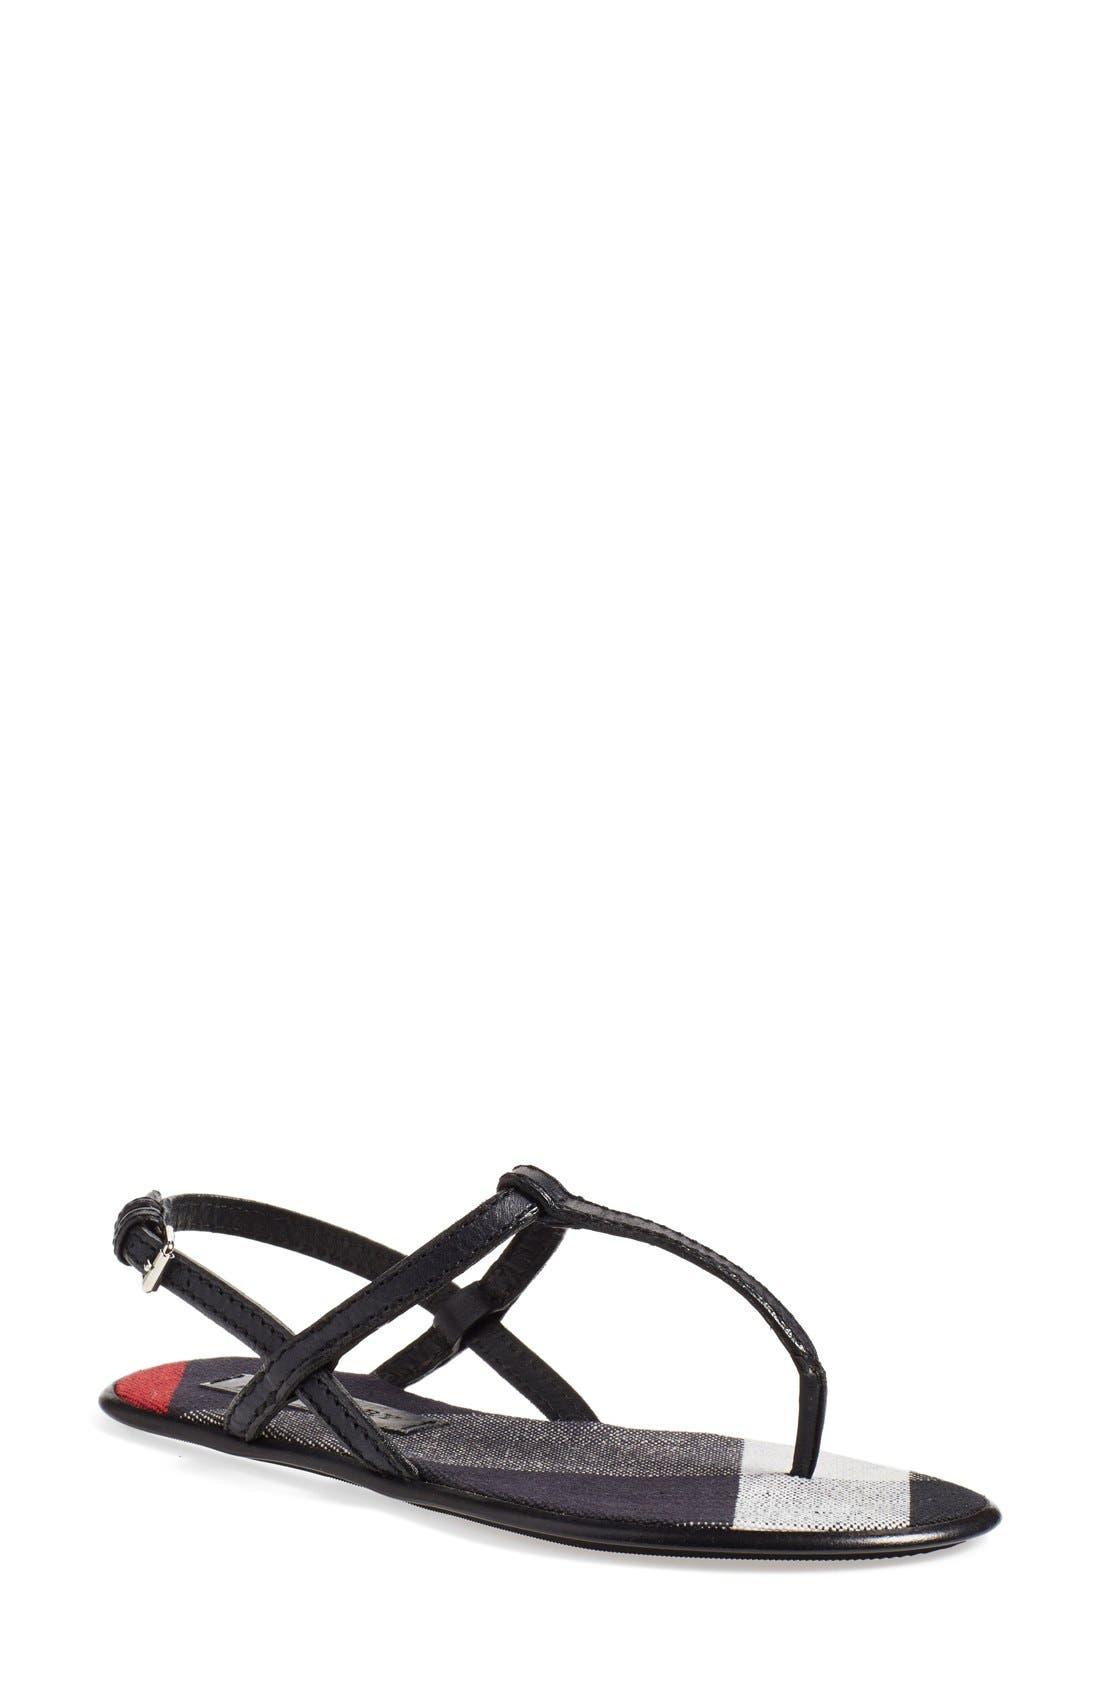 'Ingeldew' T-Strap Sandal,                         Main,                         color,